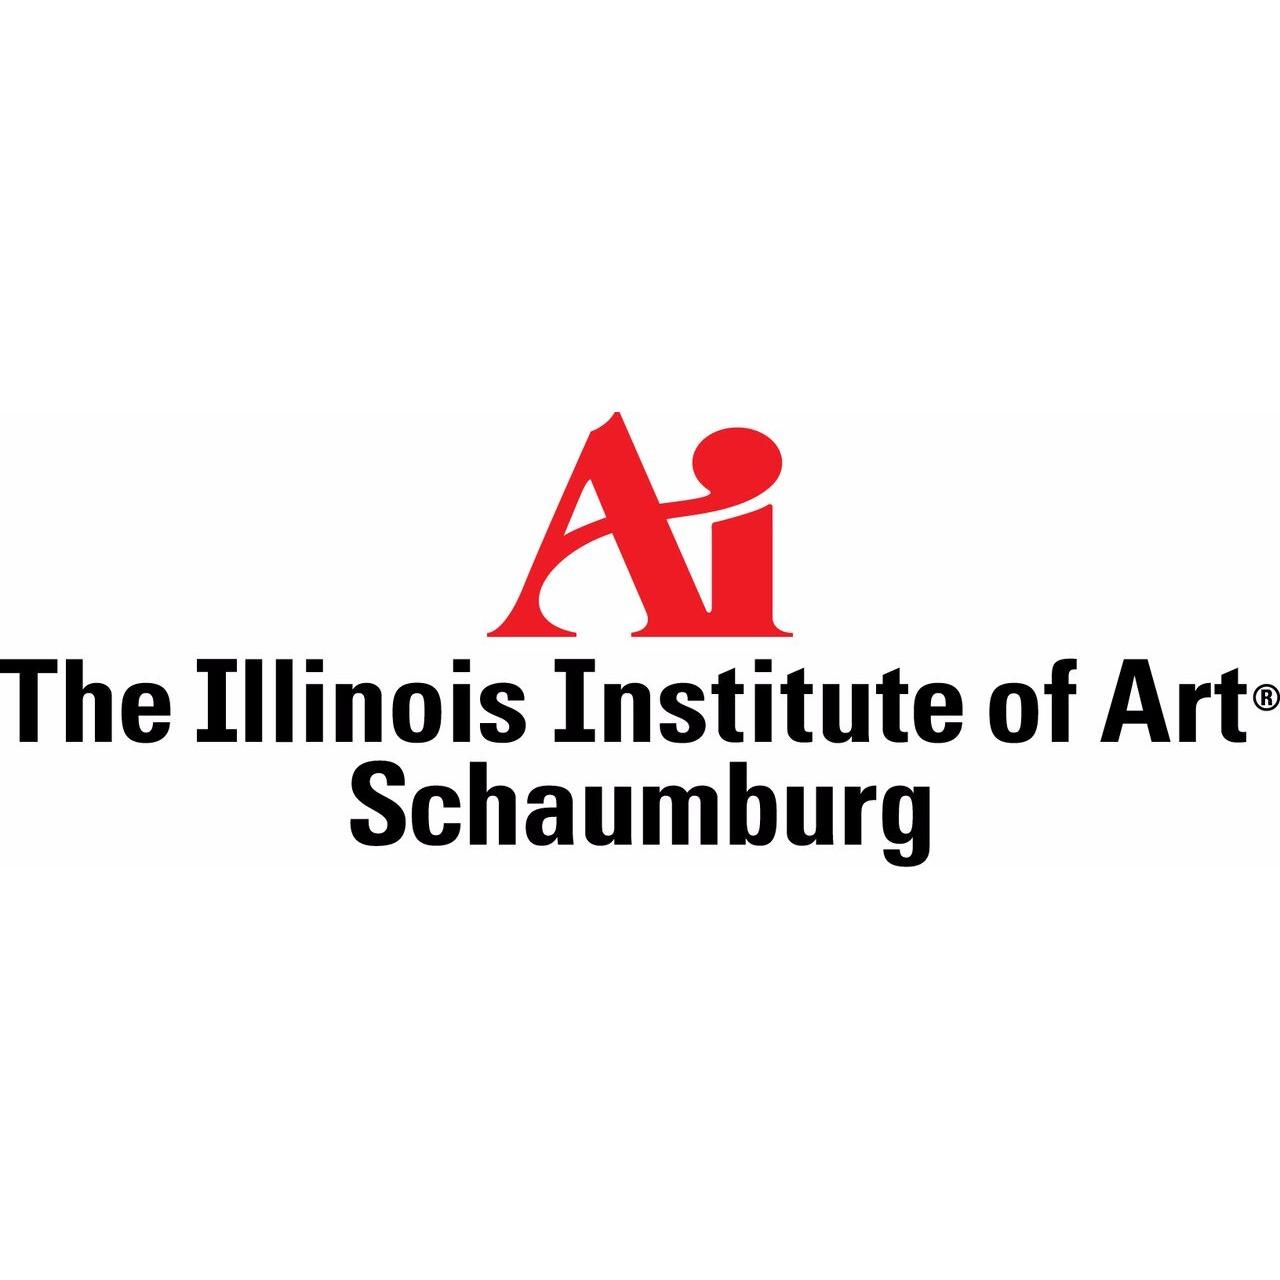 The Illinois Institute of Art - Schaumburg - Schaumburg, IL - Colleges & Universities